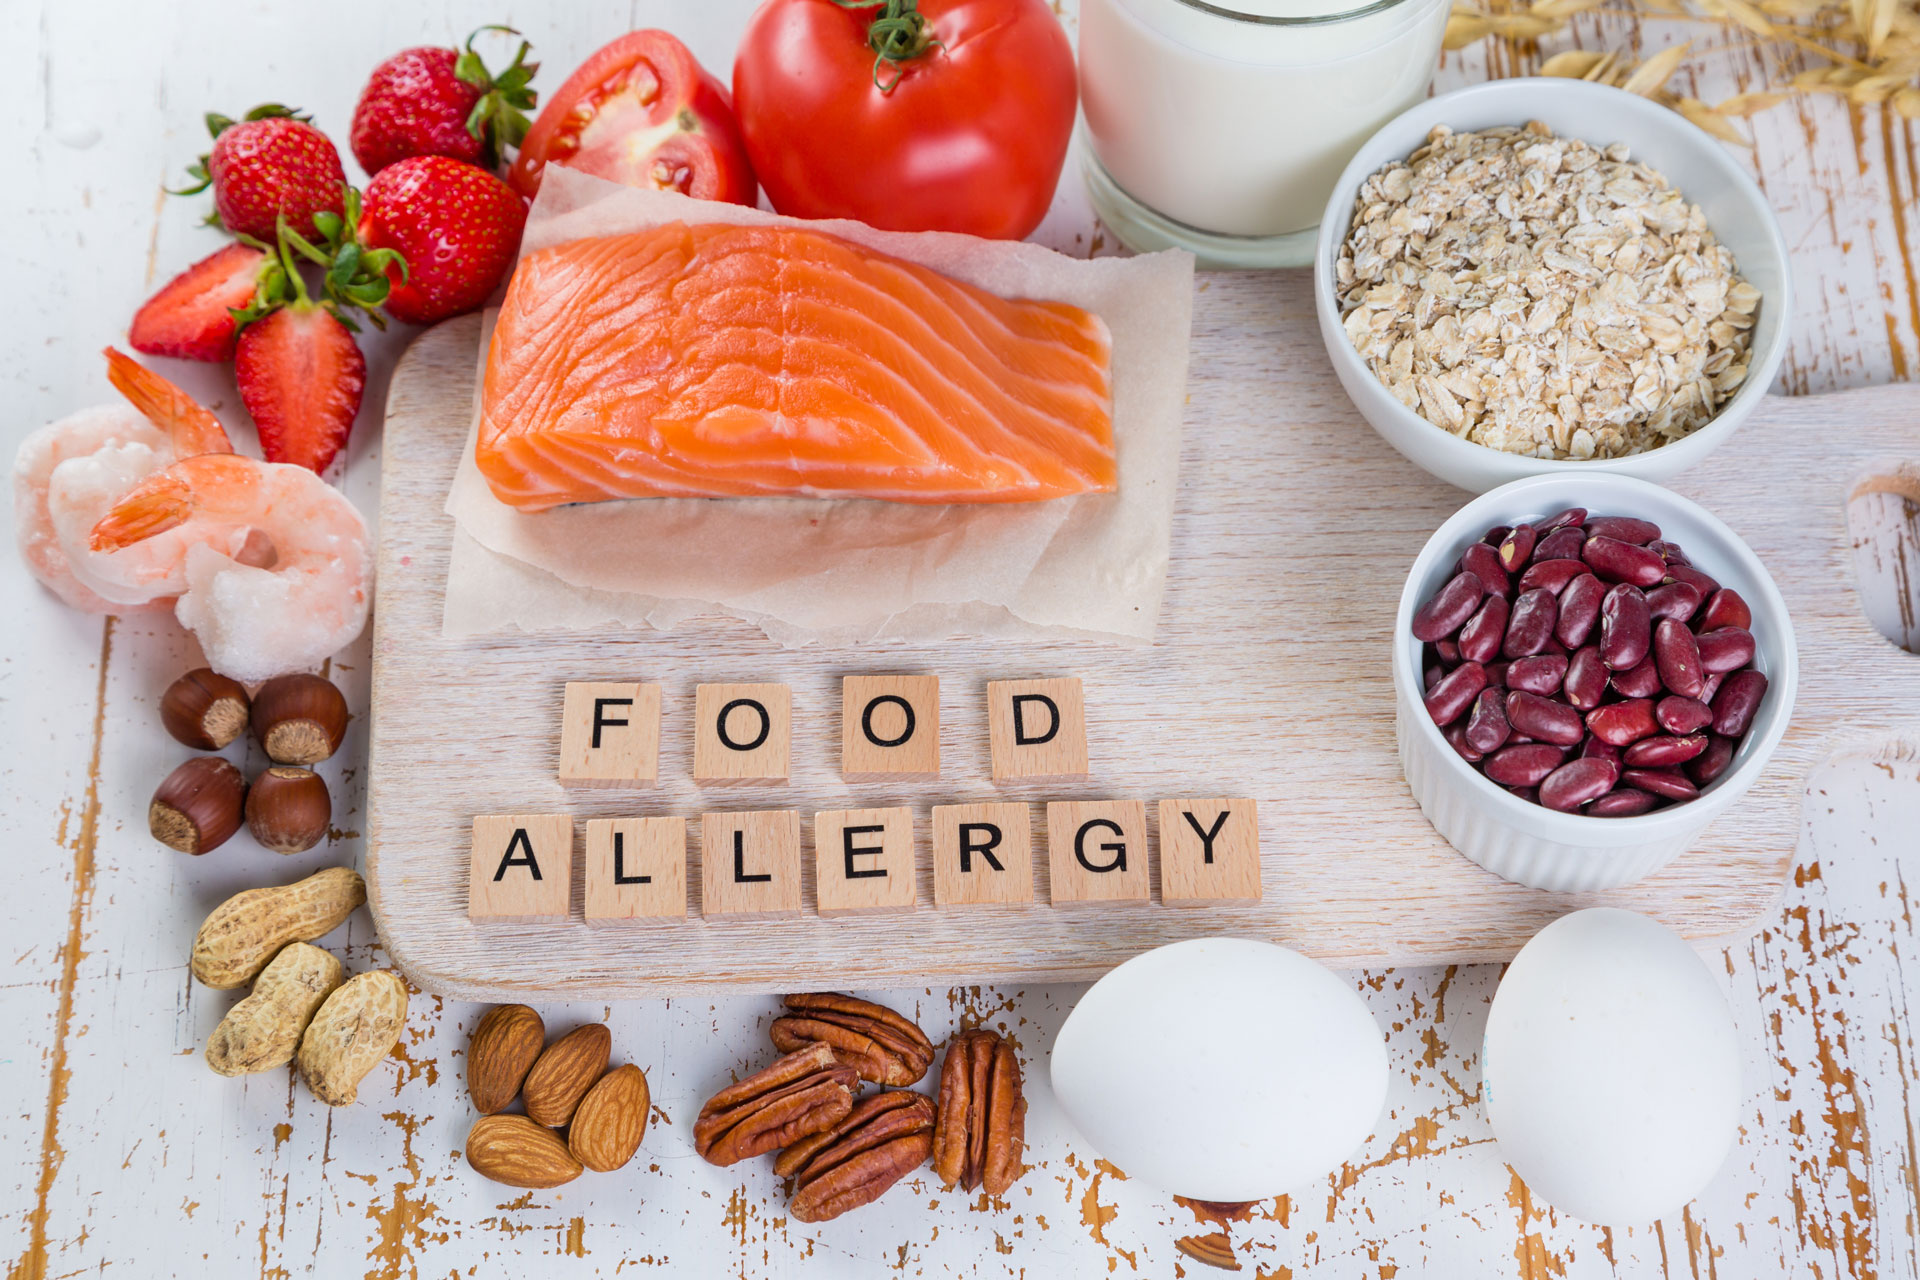 Kansas City Allergy & Asthma - Food Allergies